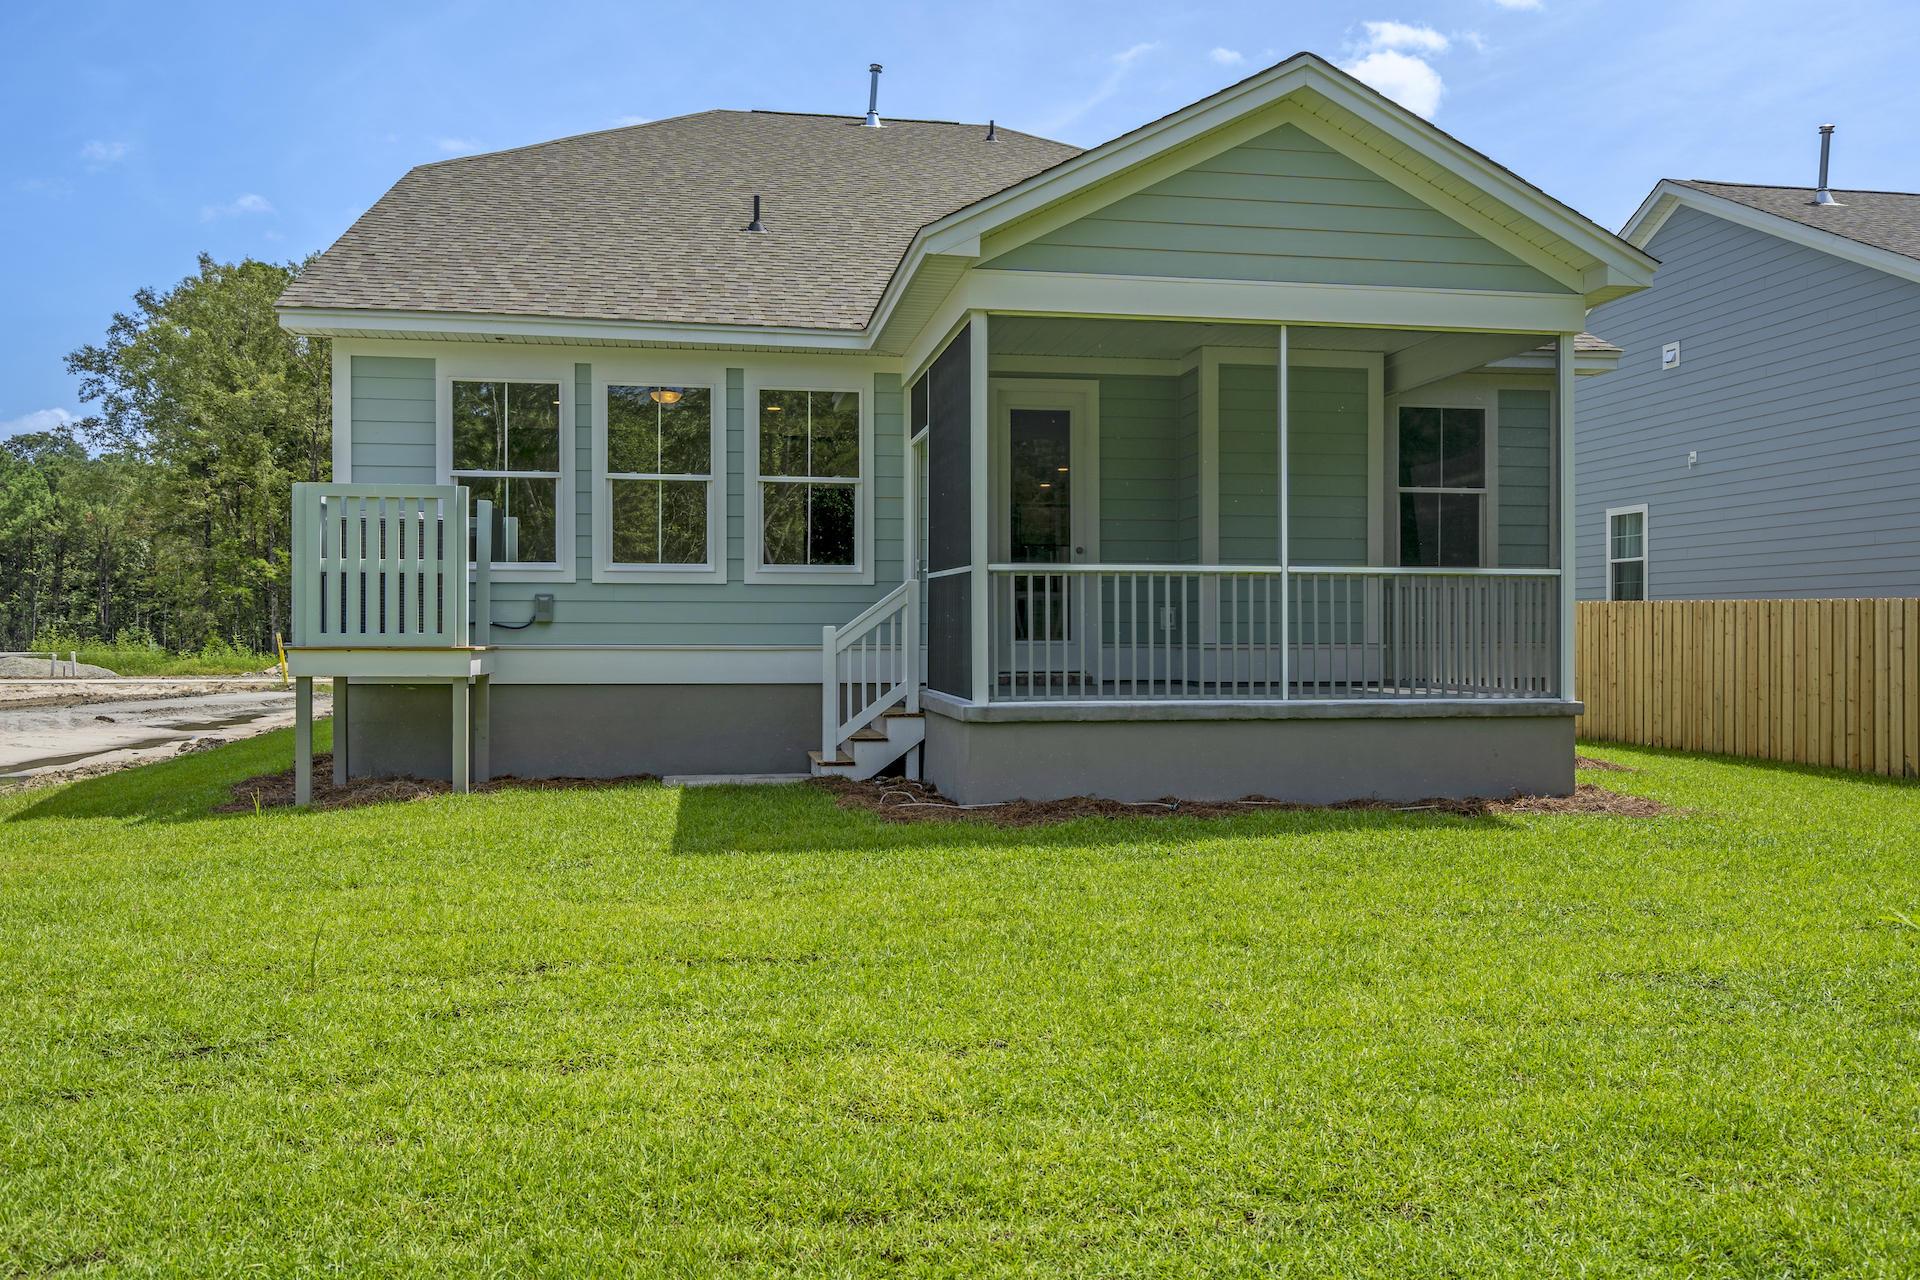 Drayton Oaks Homes For Sale - 105 Plowden Mill, Summerville, SC - 30